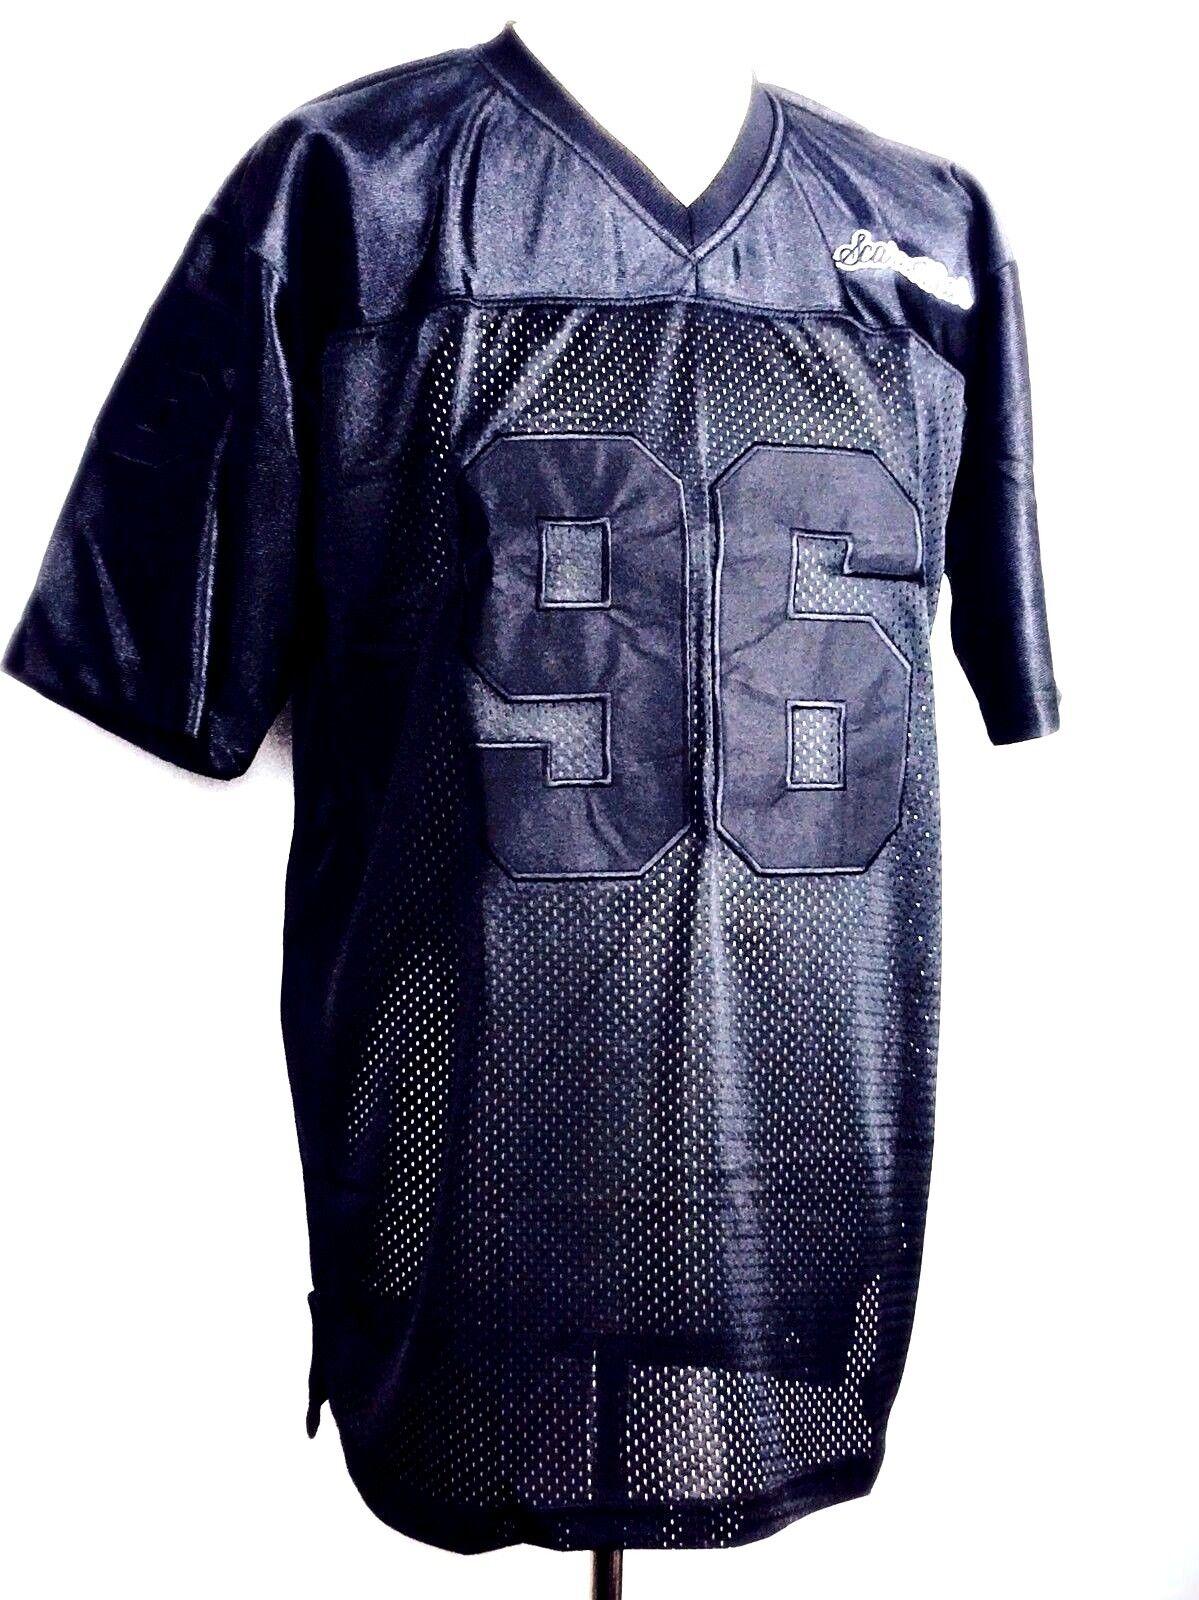 RICAMO Uomo Nero Maglia NFL Football Americano Camicia di Seta Seta Seta T-shirt S-4XL 41bbac